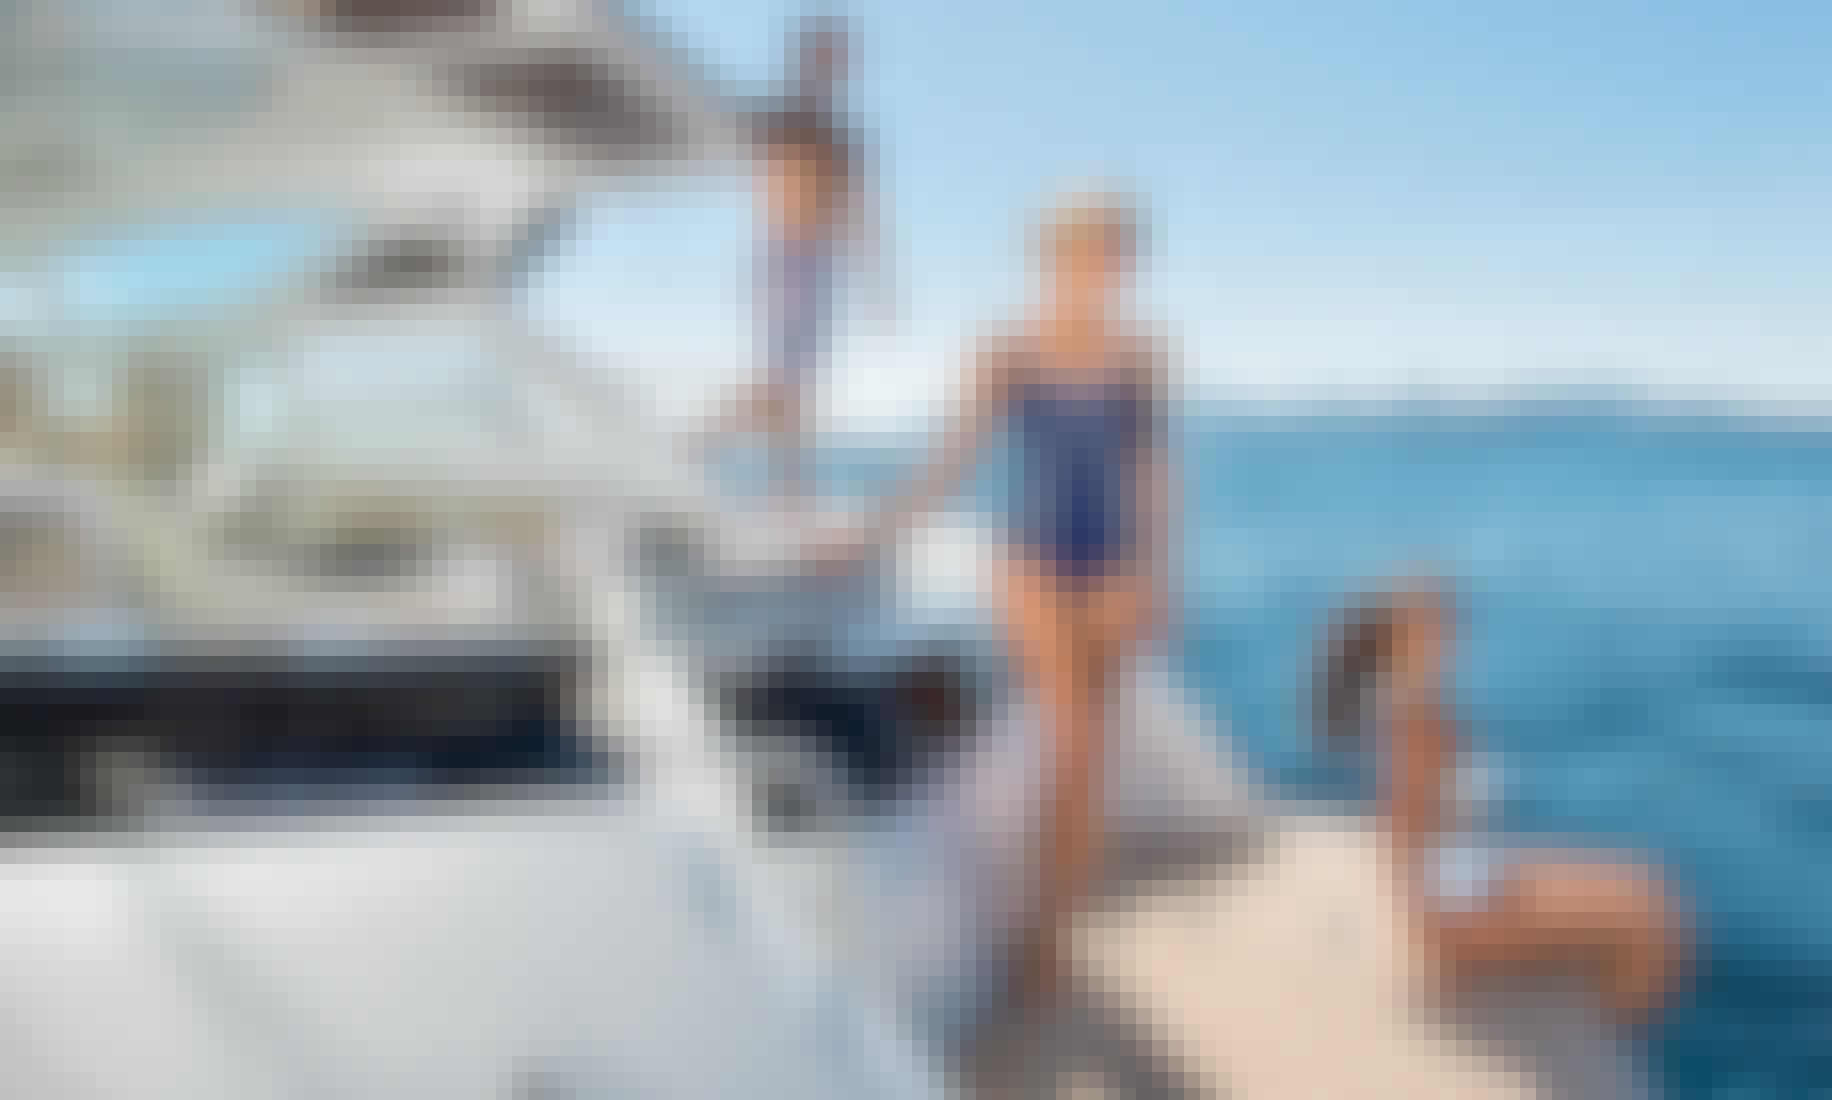 Gran Turismo 40 Motor Yacht Charter in Mauritius